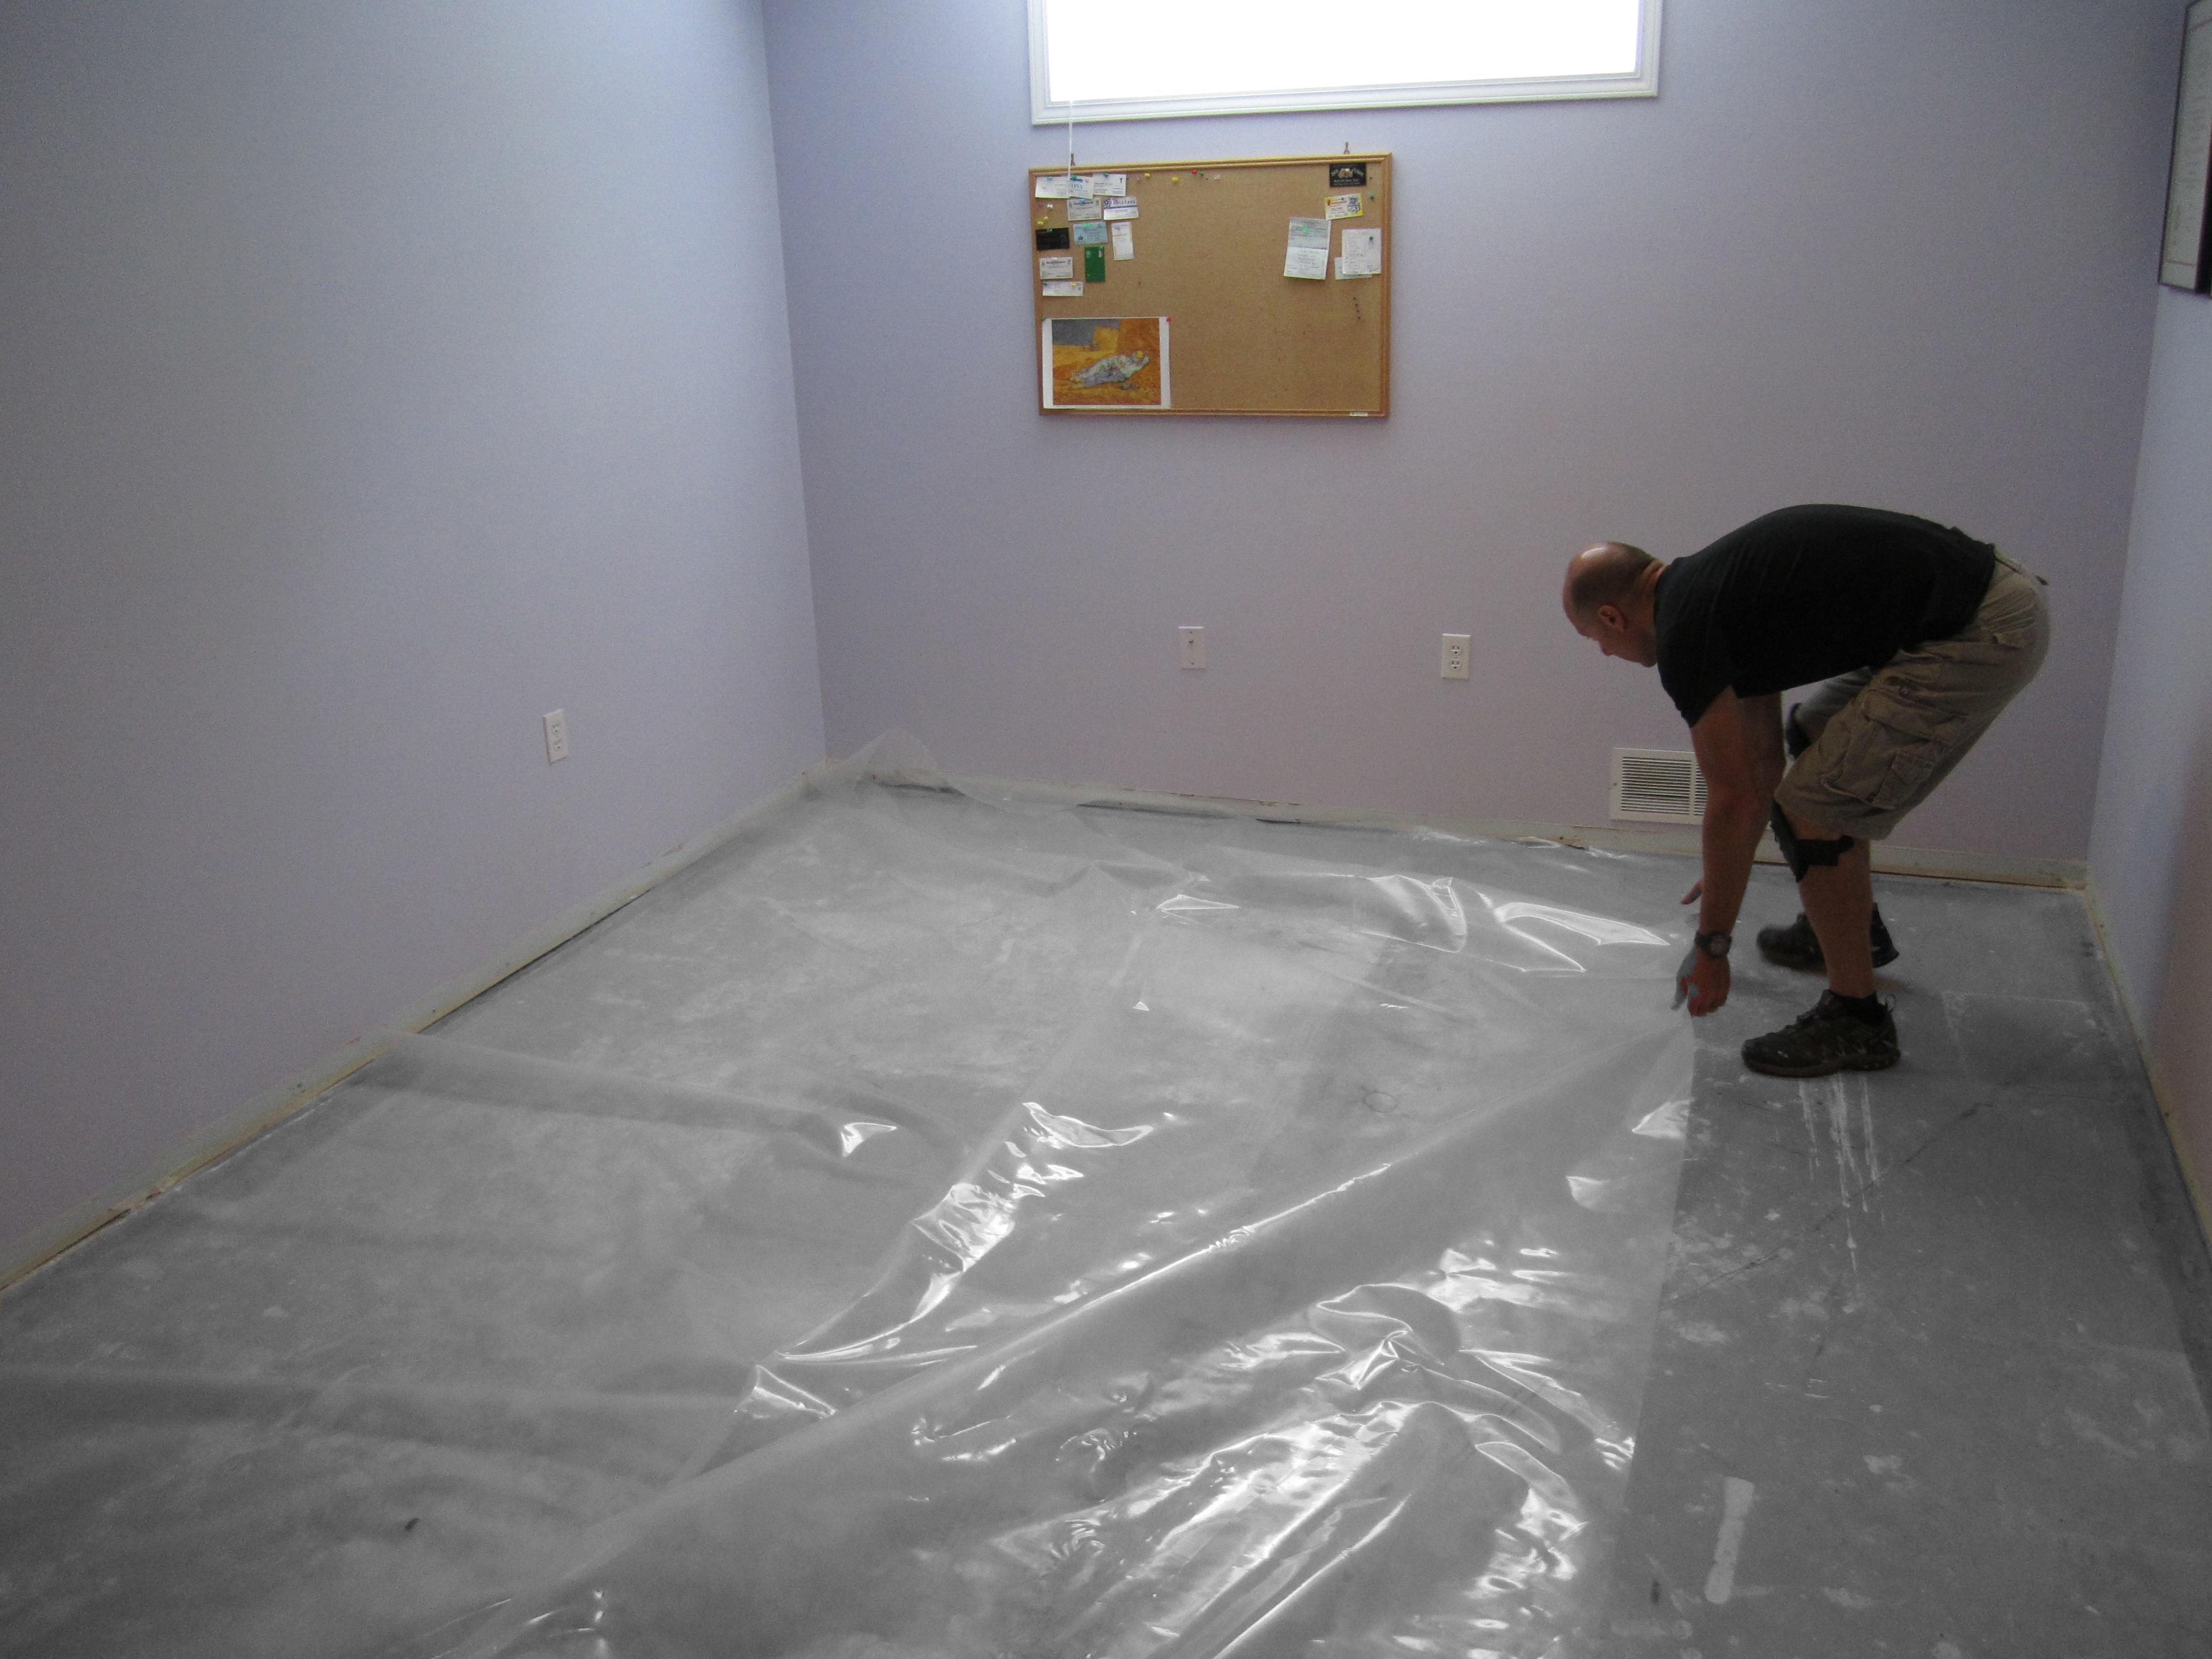 Insulate Basement Floor Tile